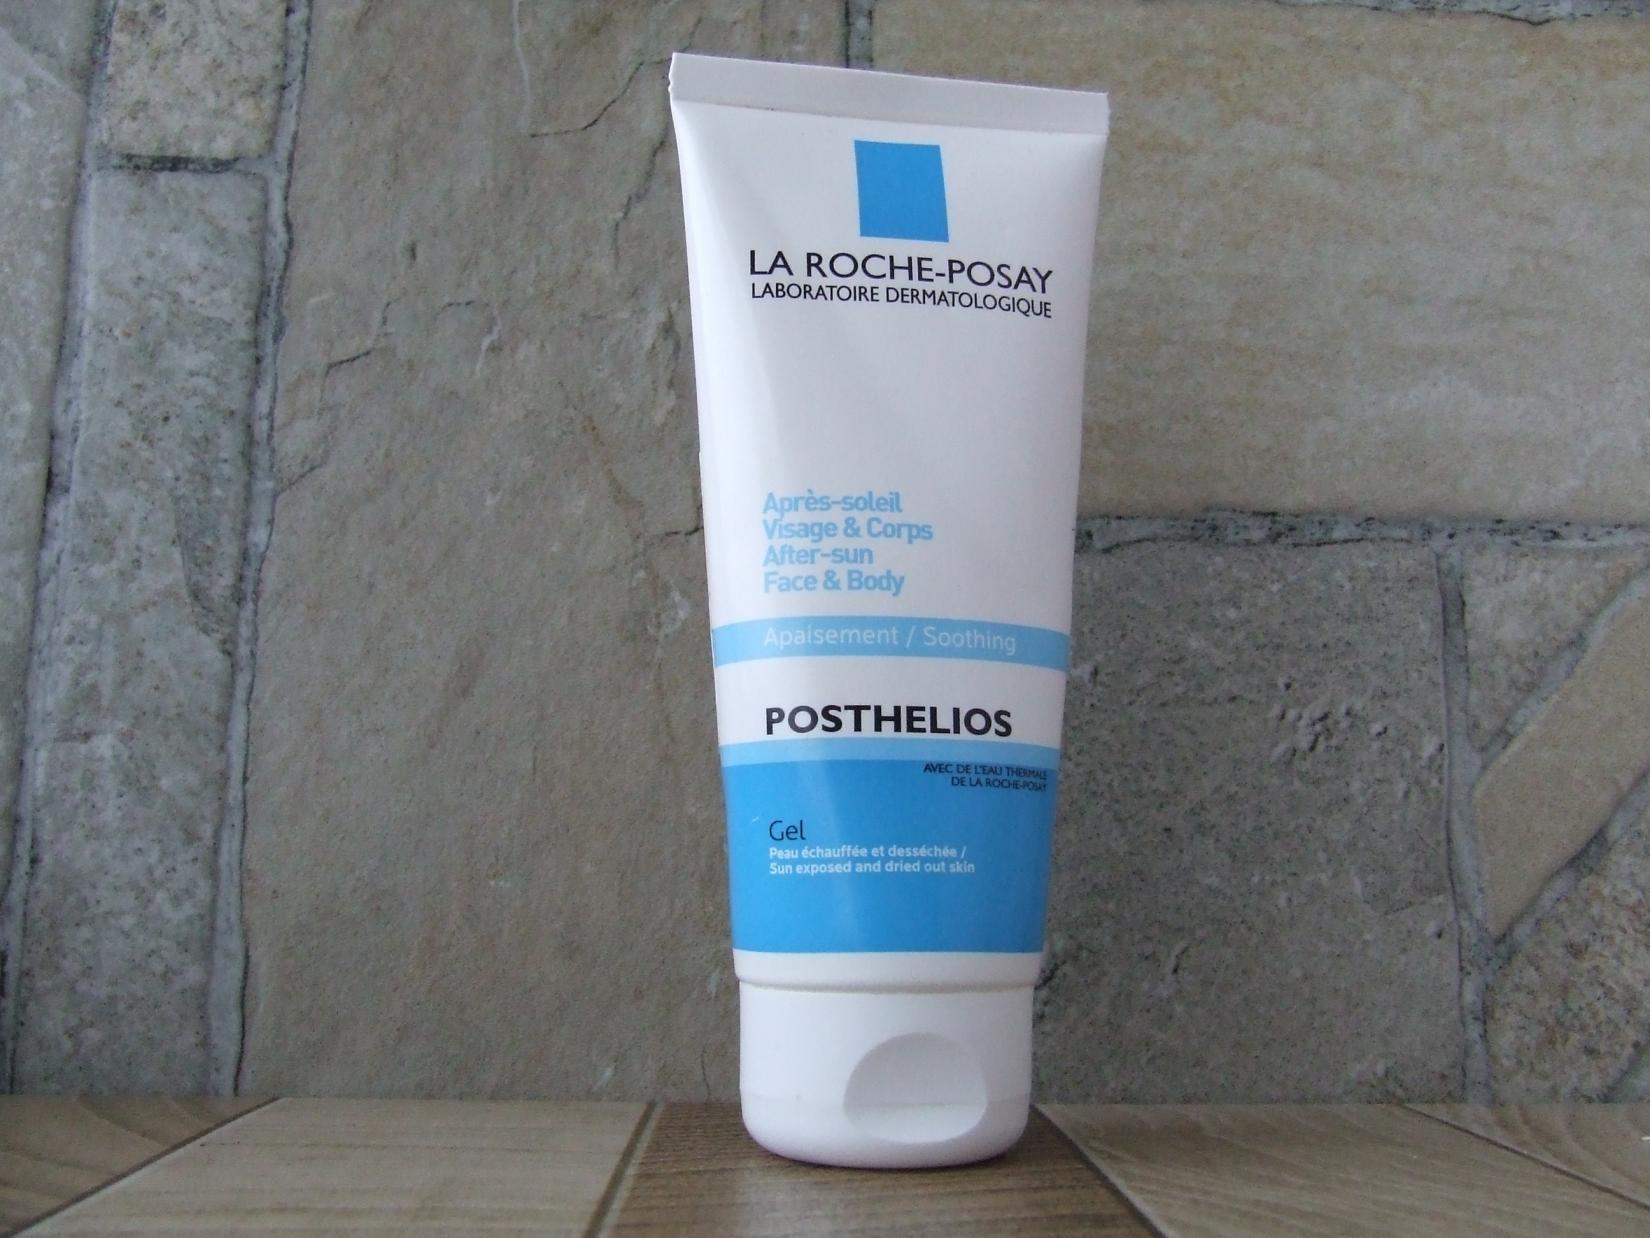 La Roche-Posay Posthelios - восстанавливающее средство для лица и тела после загара